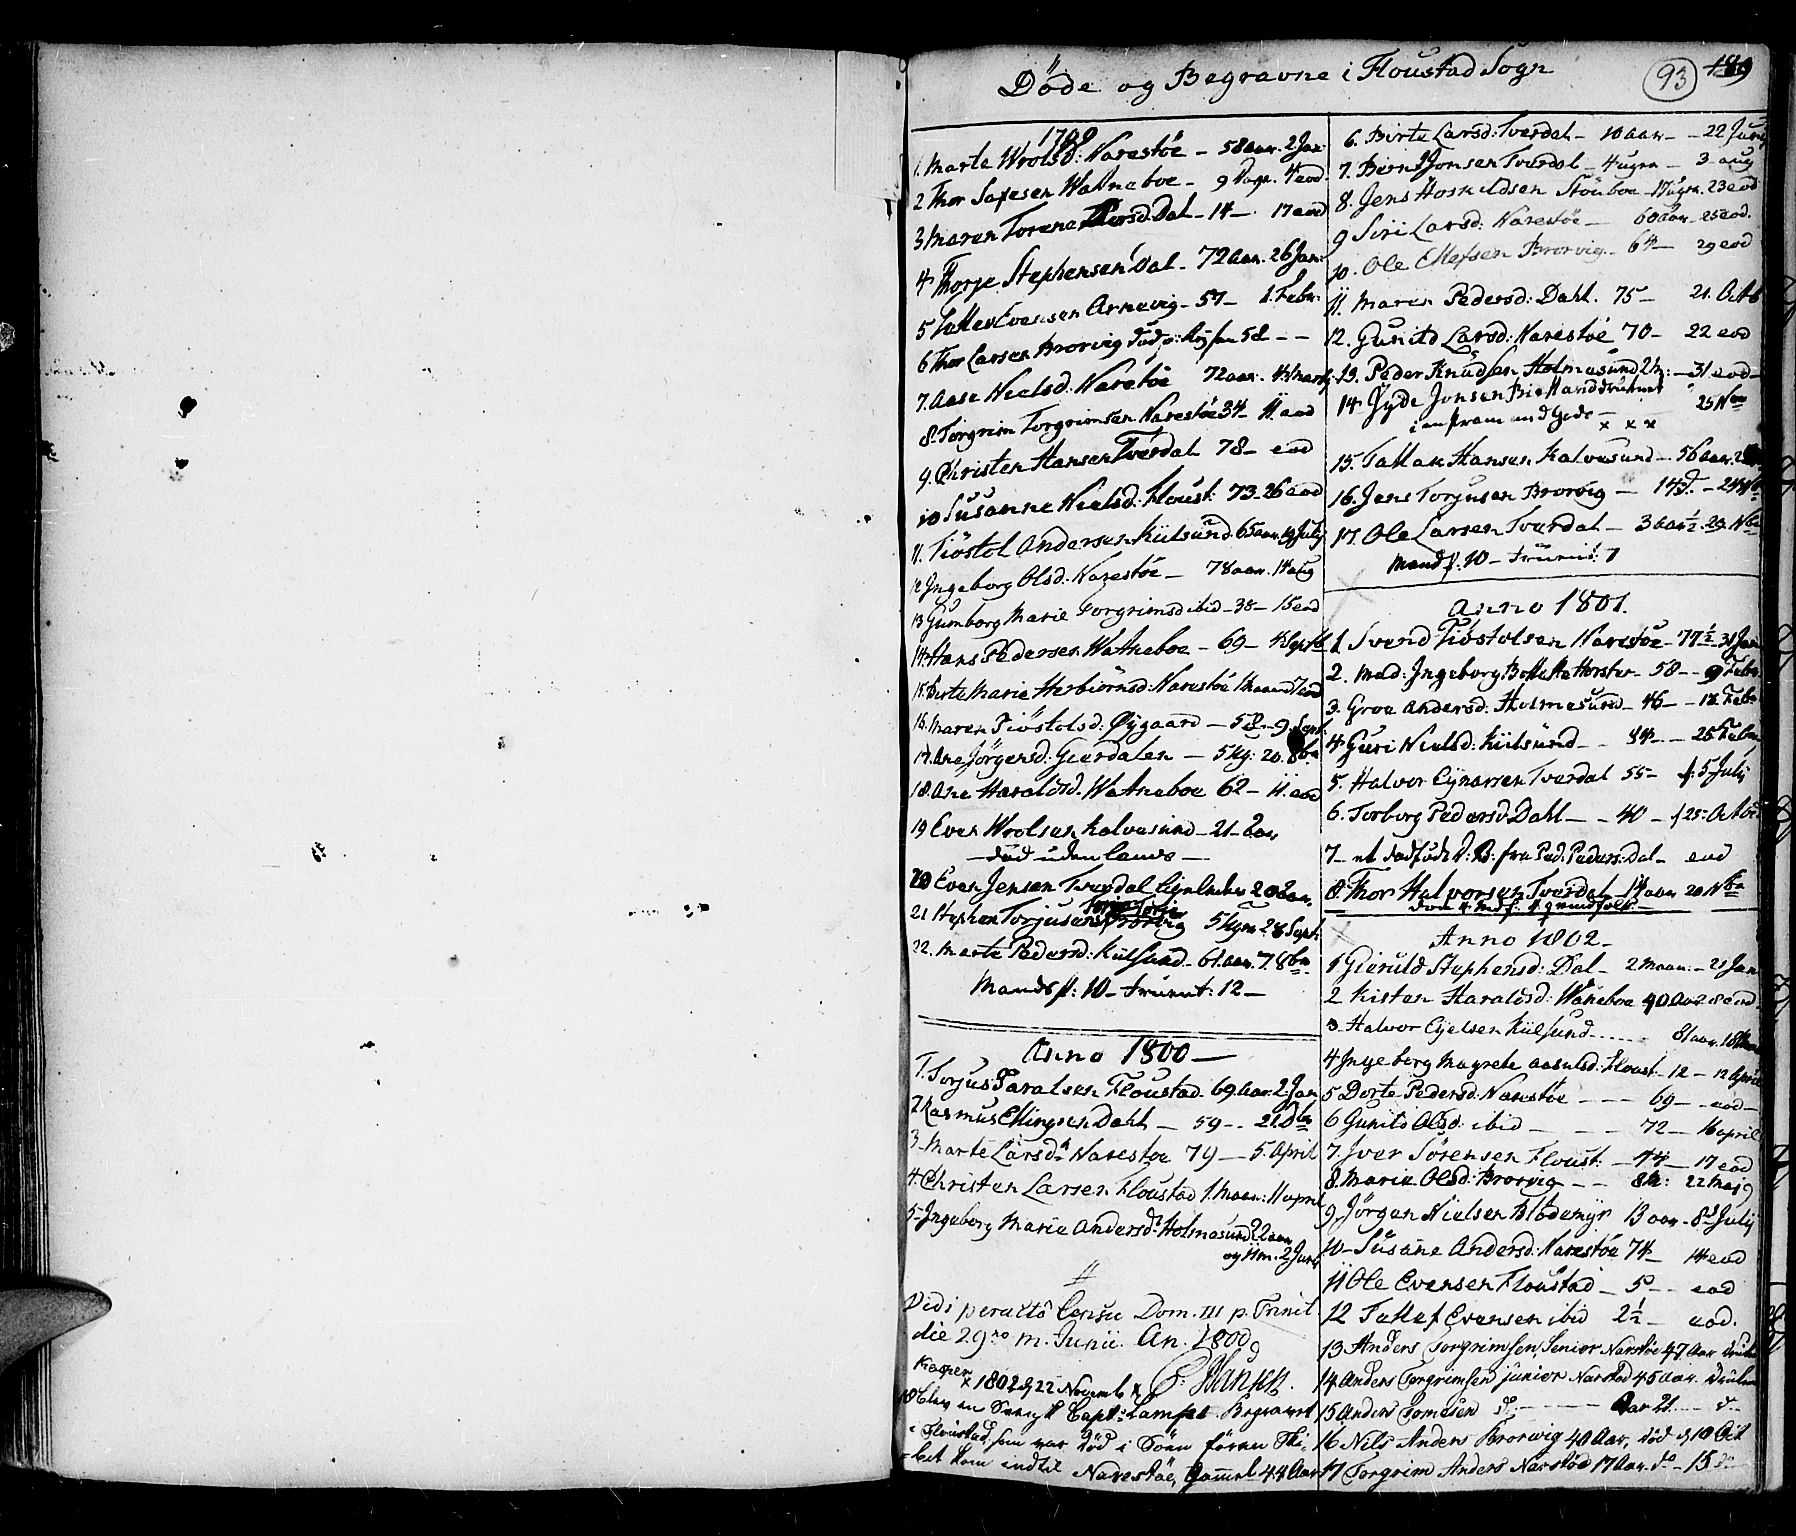 SAK, Holt sokneprestkontor, F/Fa/L0001: Ministerialbok nr. A 1 /4, 1721-1812, s. 93